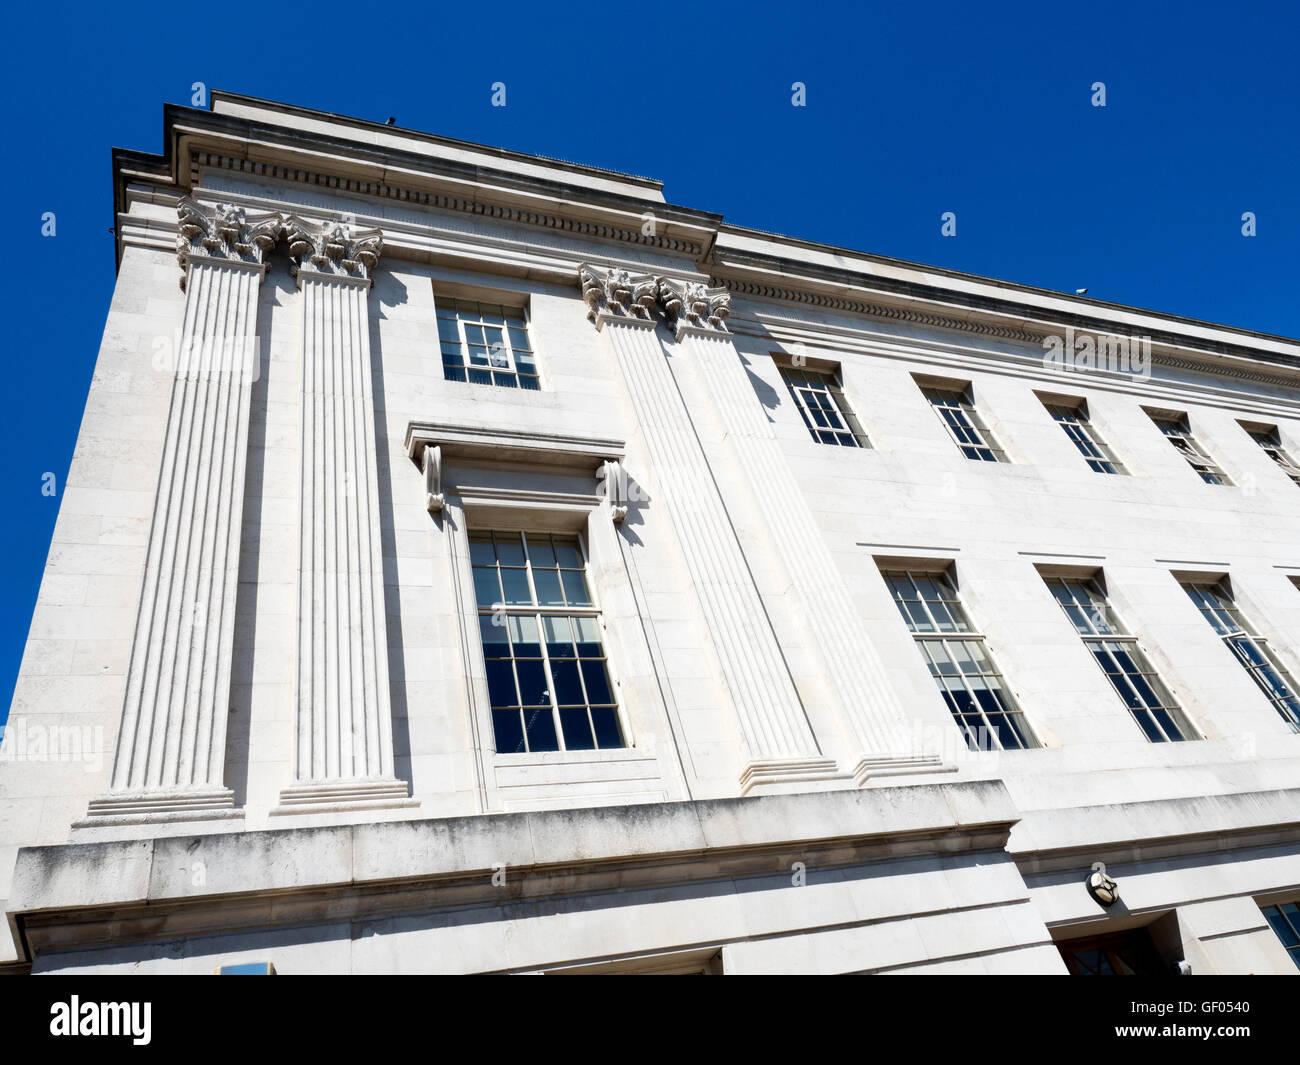 Portland Stone Facade on the Town Hall at Barnsley South Yorkshire England - Stock Image